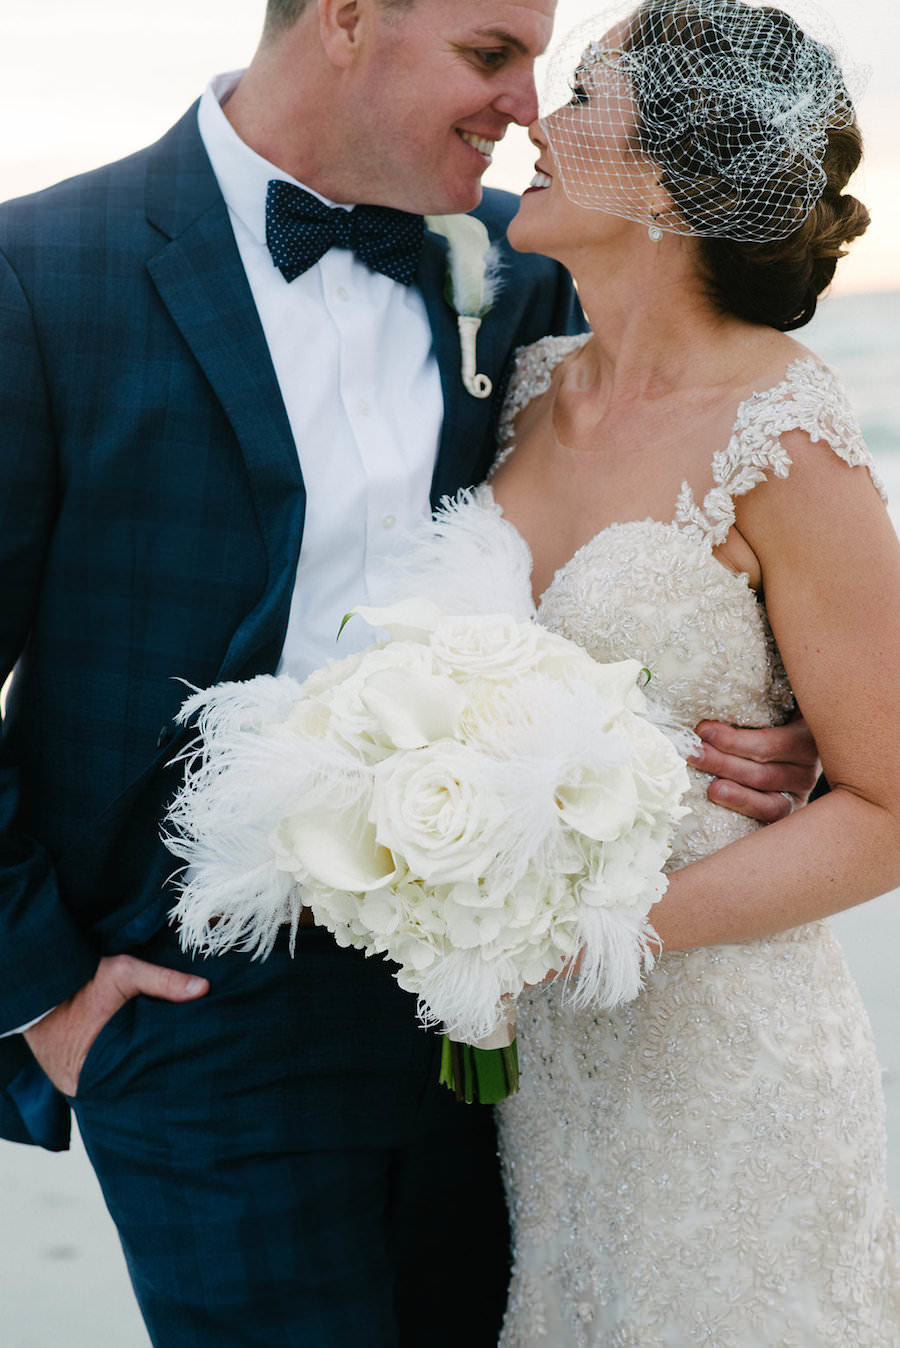 Outdoor St. Petersburg Bride and Groom Wedding Portrait   Tampa Bay Wedding Photographer Jonathan Fanning Studio and Gallery